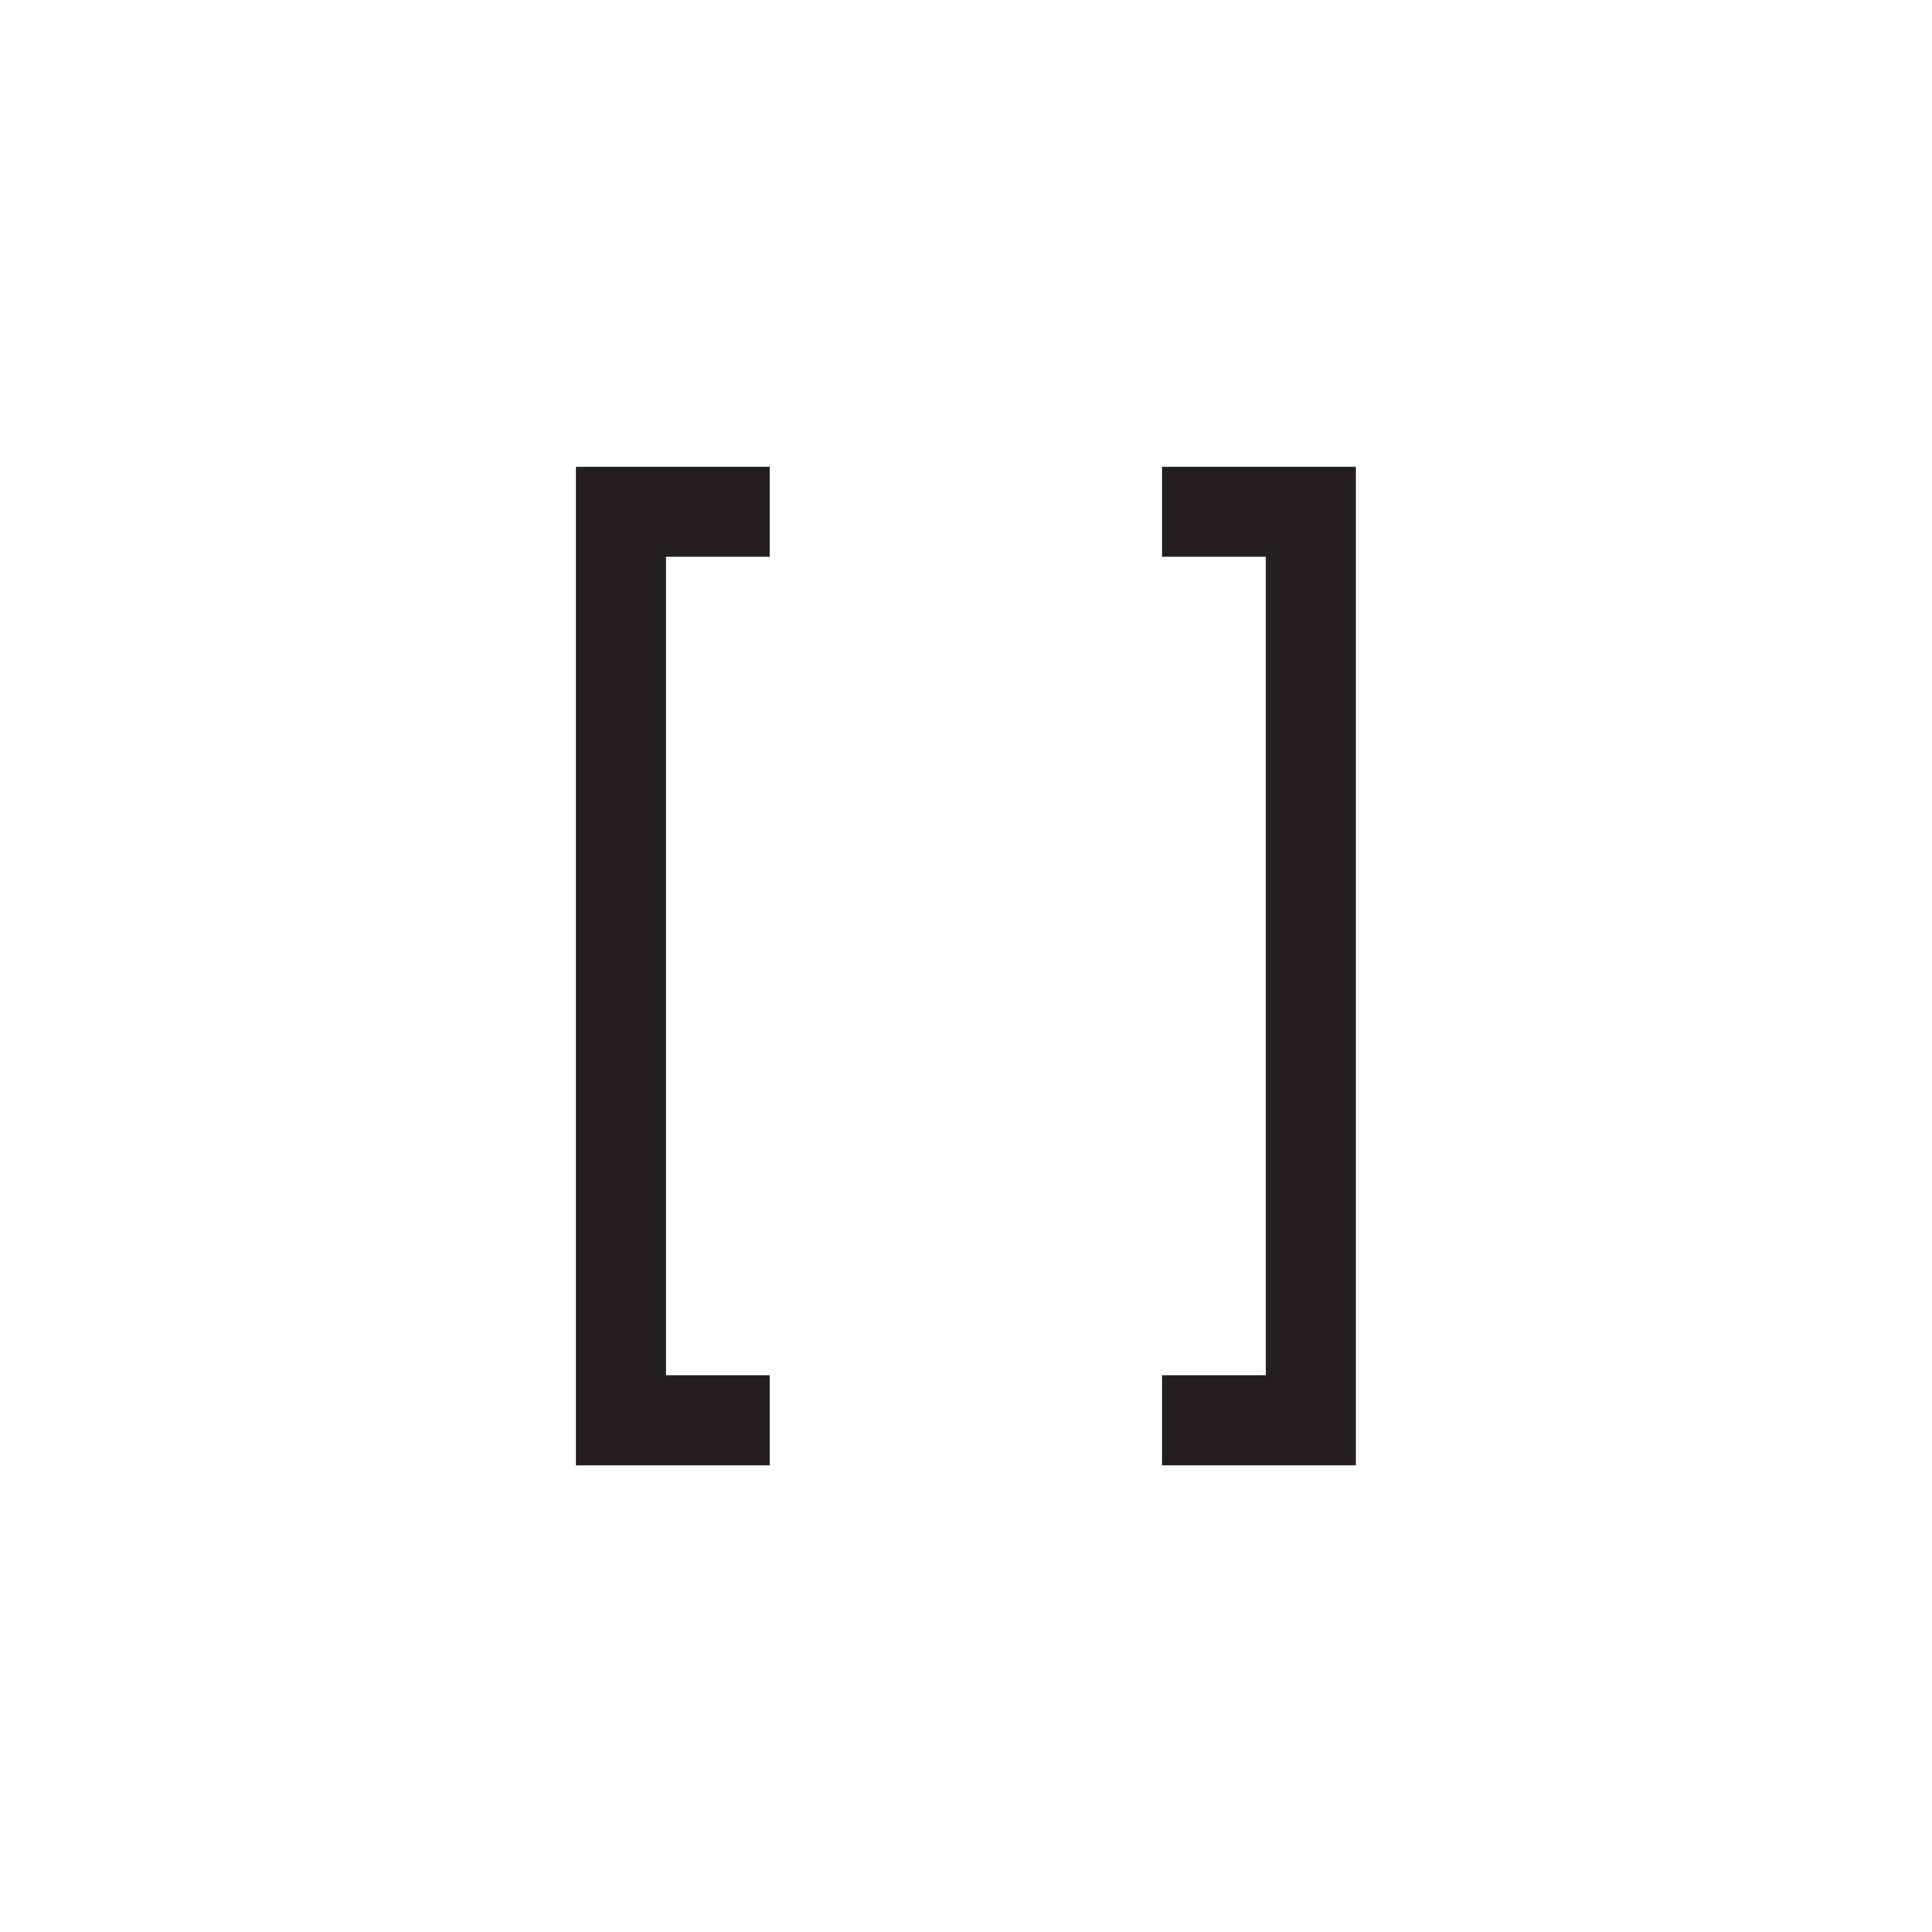 Imago rebranded logo: black brackets.